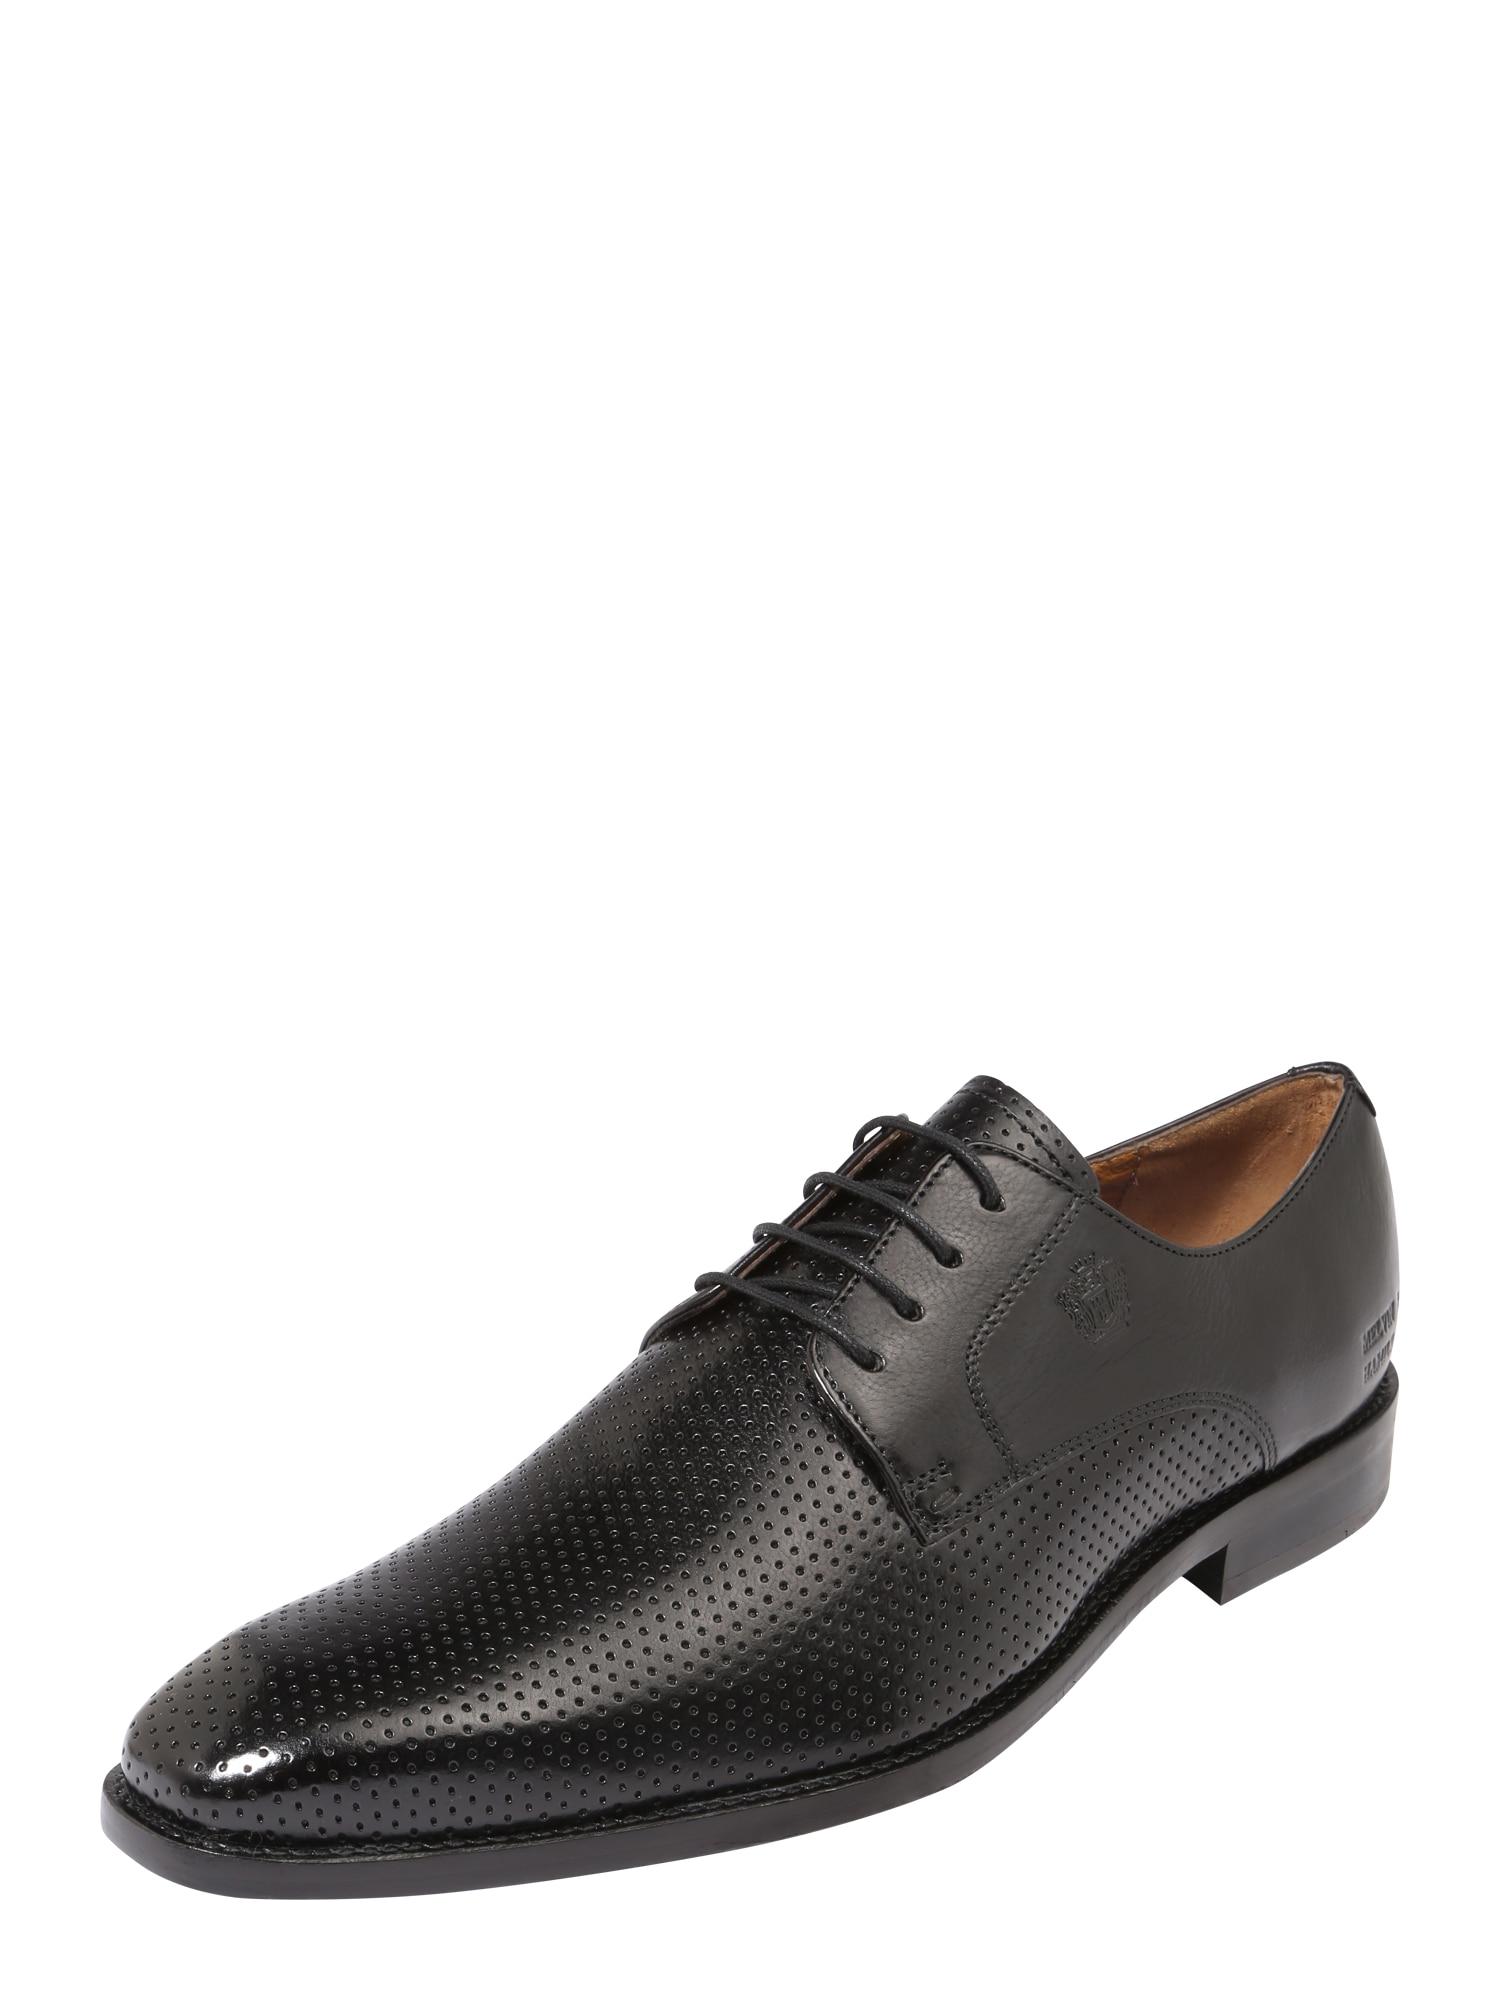 Šněrovací boty Martin 1 černá MELVIN & HAMILTON